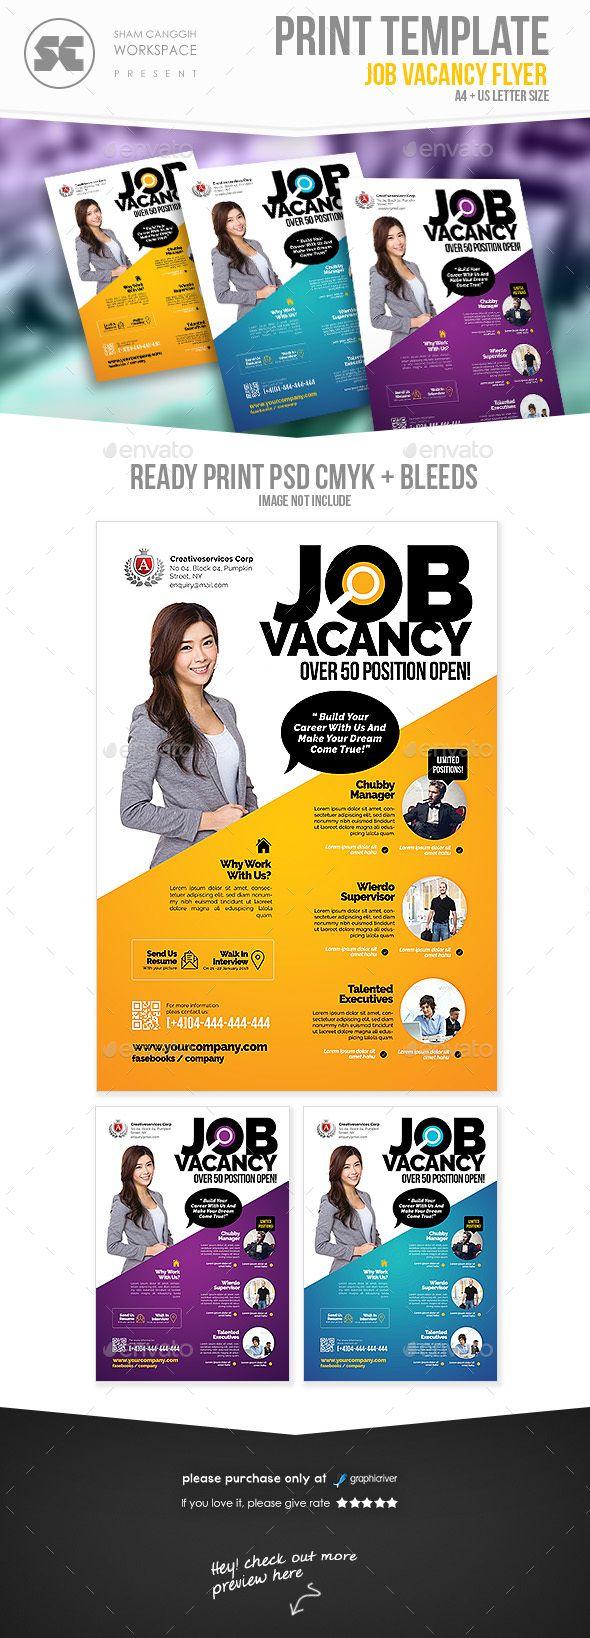 Job Vacancy Flyer Template PSD